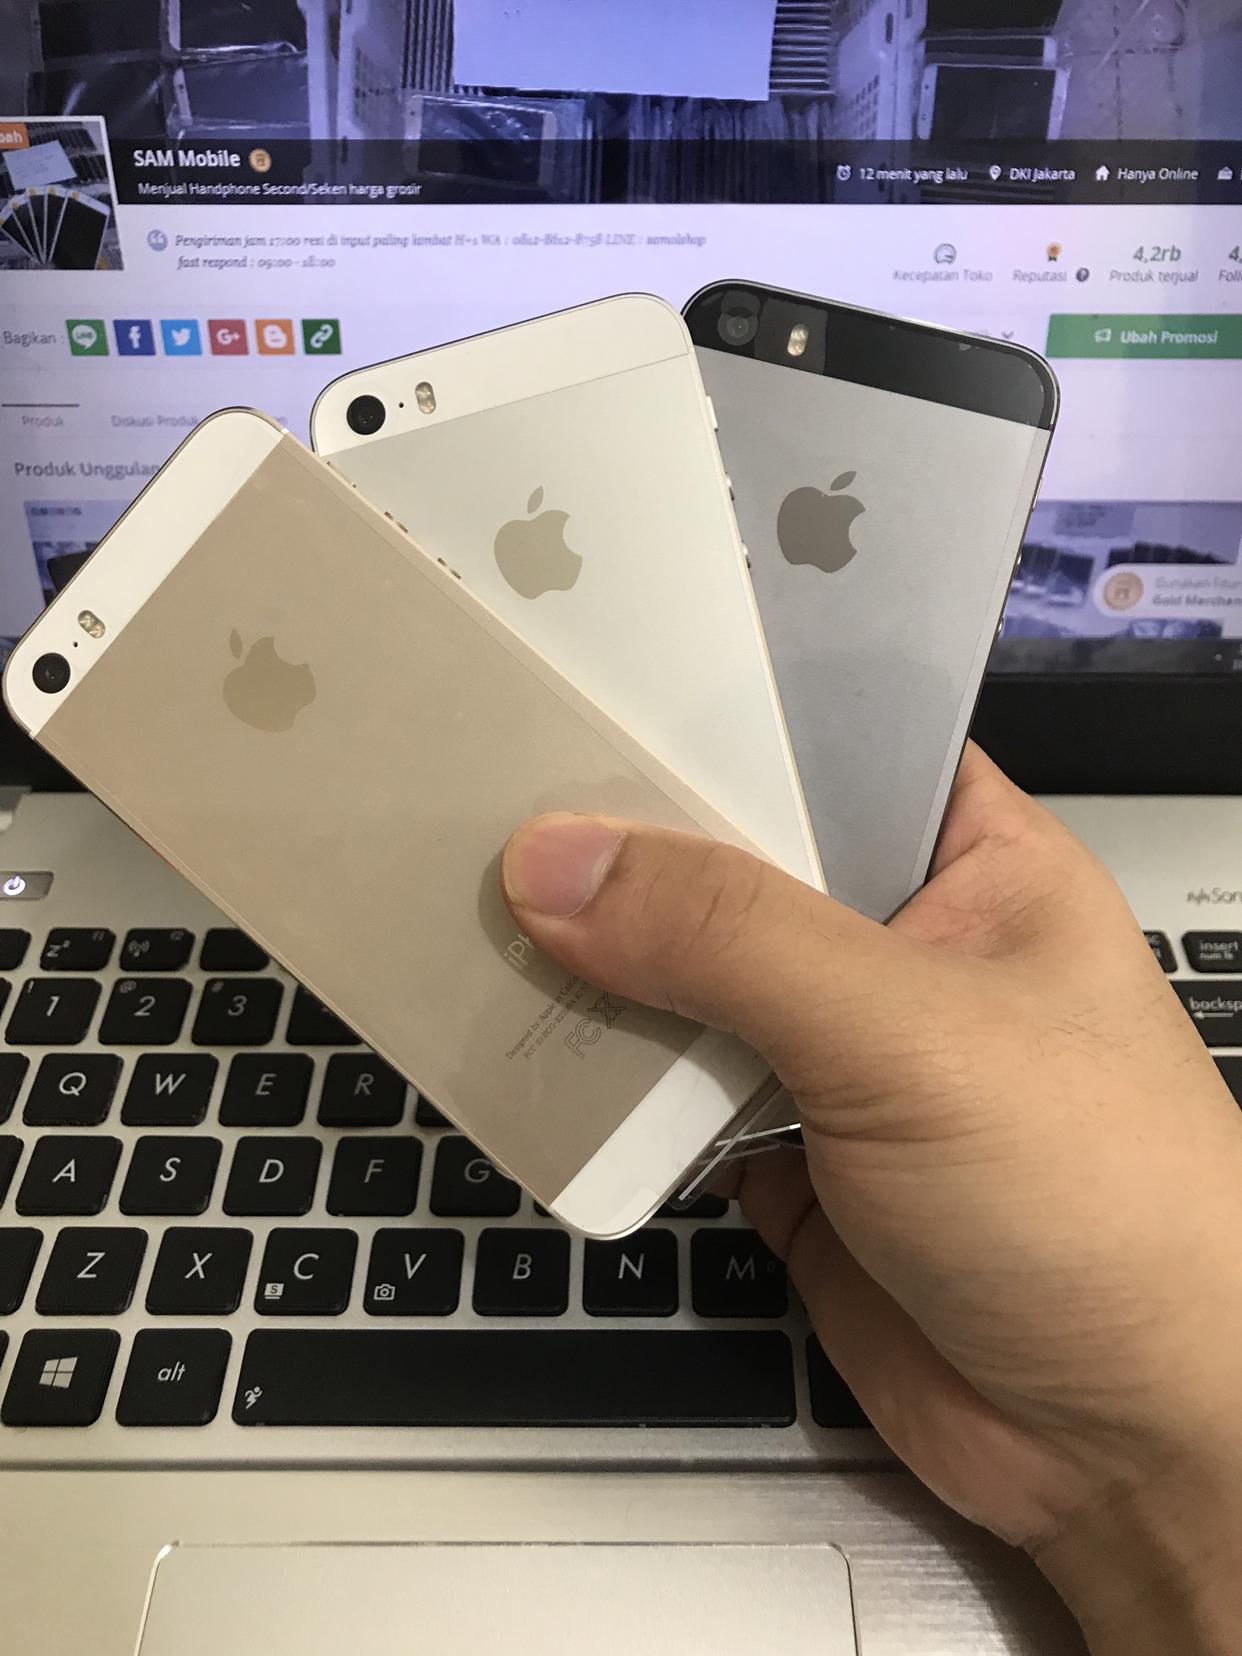 Jual Apple iPhone 5S Grey - Gold - Silver 64GB Second FULLSET ... d11b71d263